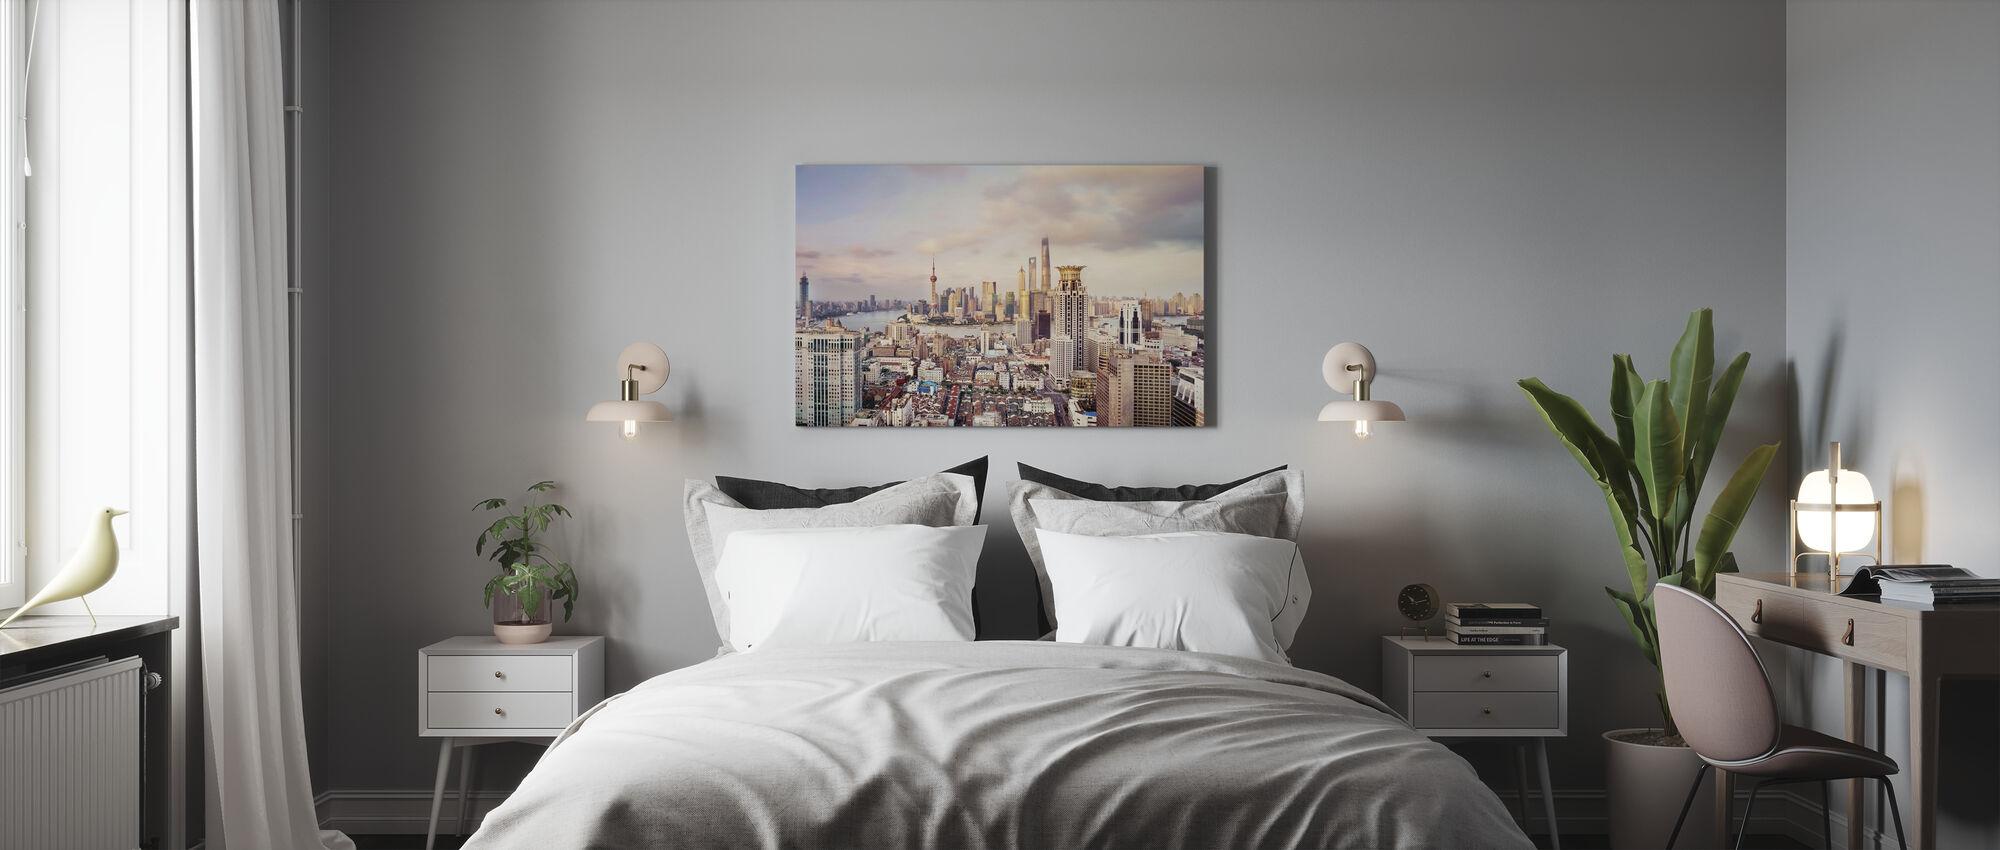 Skyline van Shanghai - Canvas print - Slaapkamer